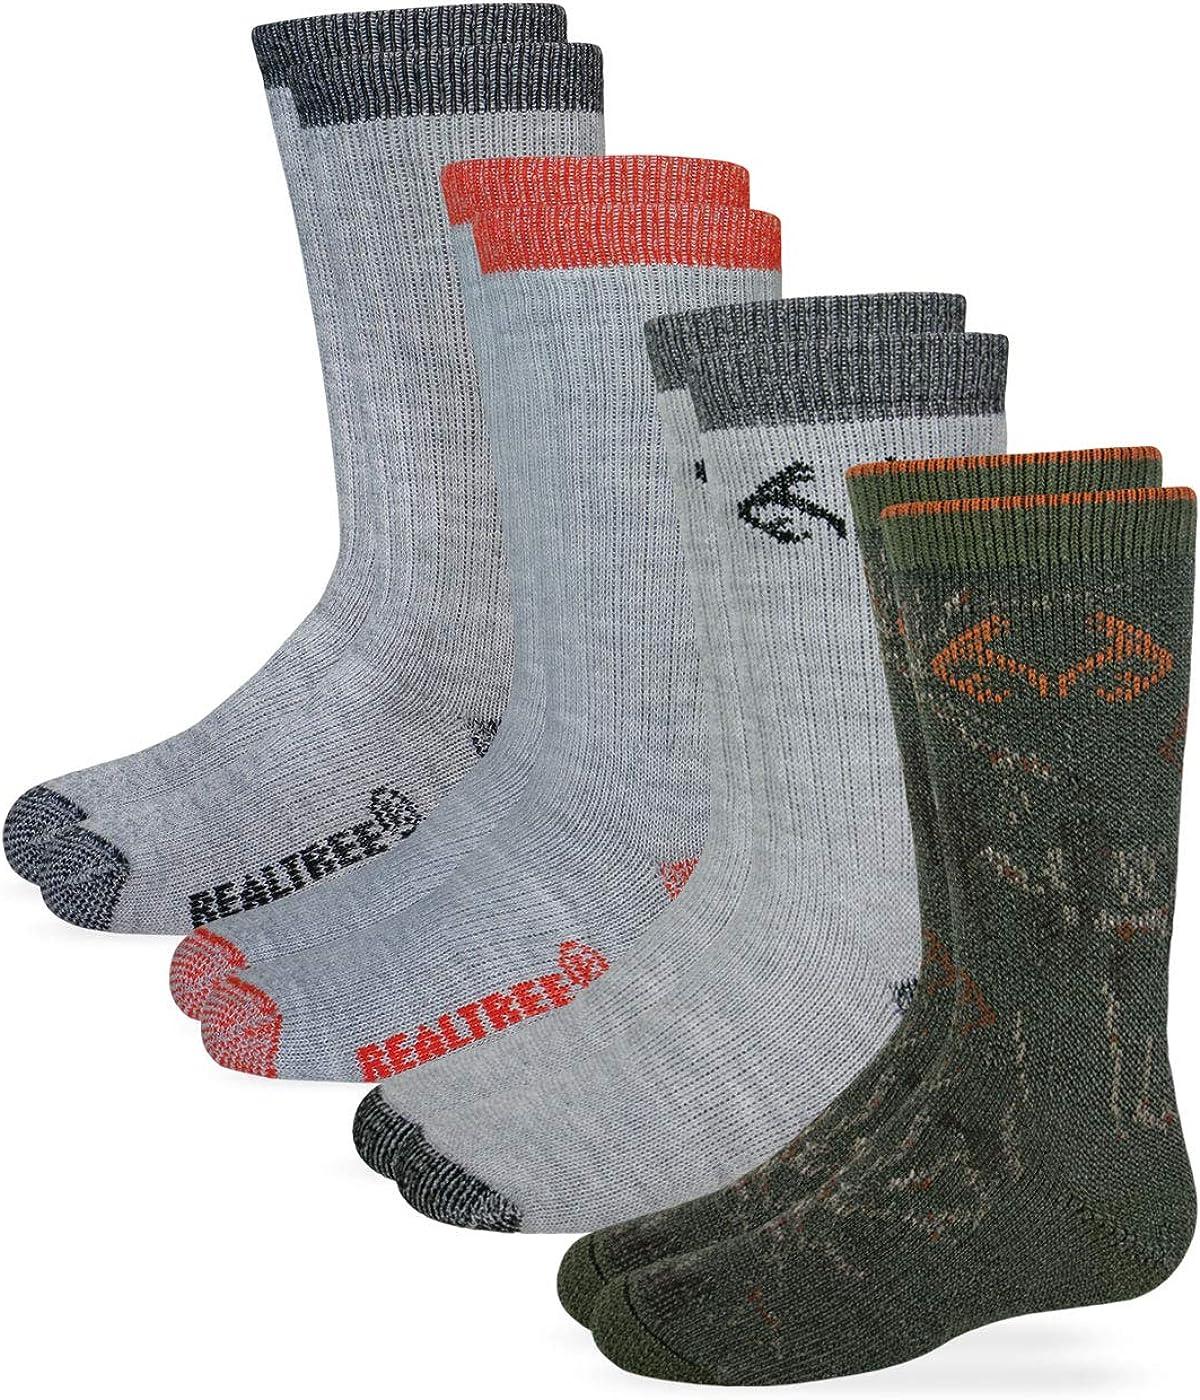 Realtree Boys Boot Sock (4- Pack)